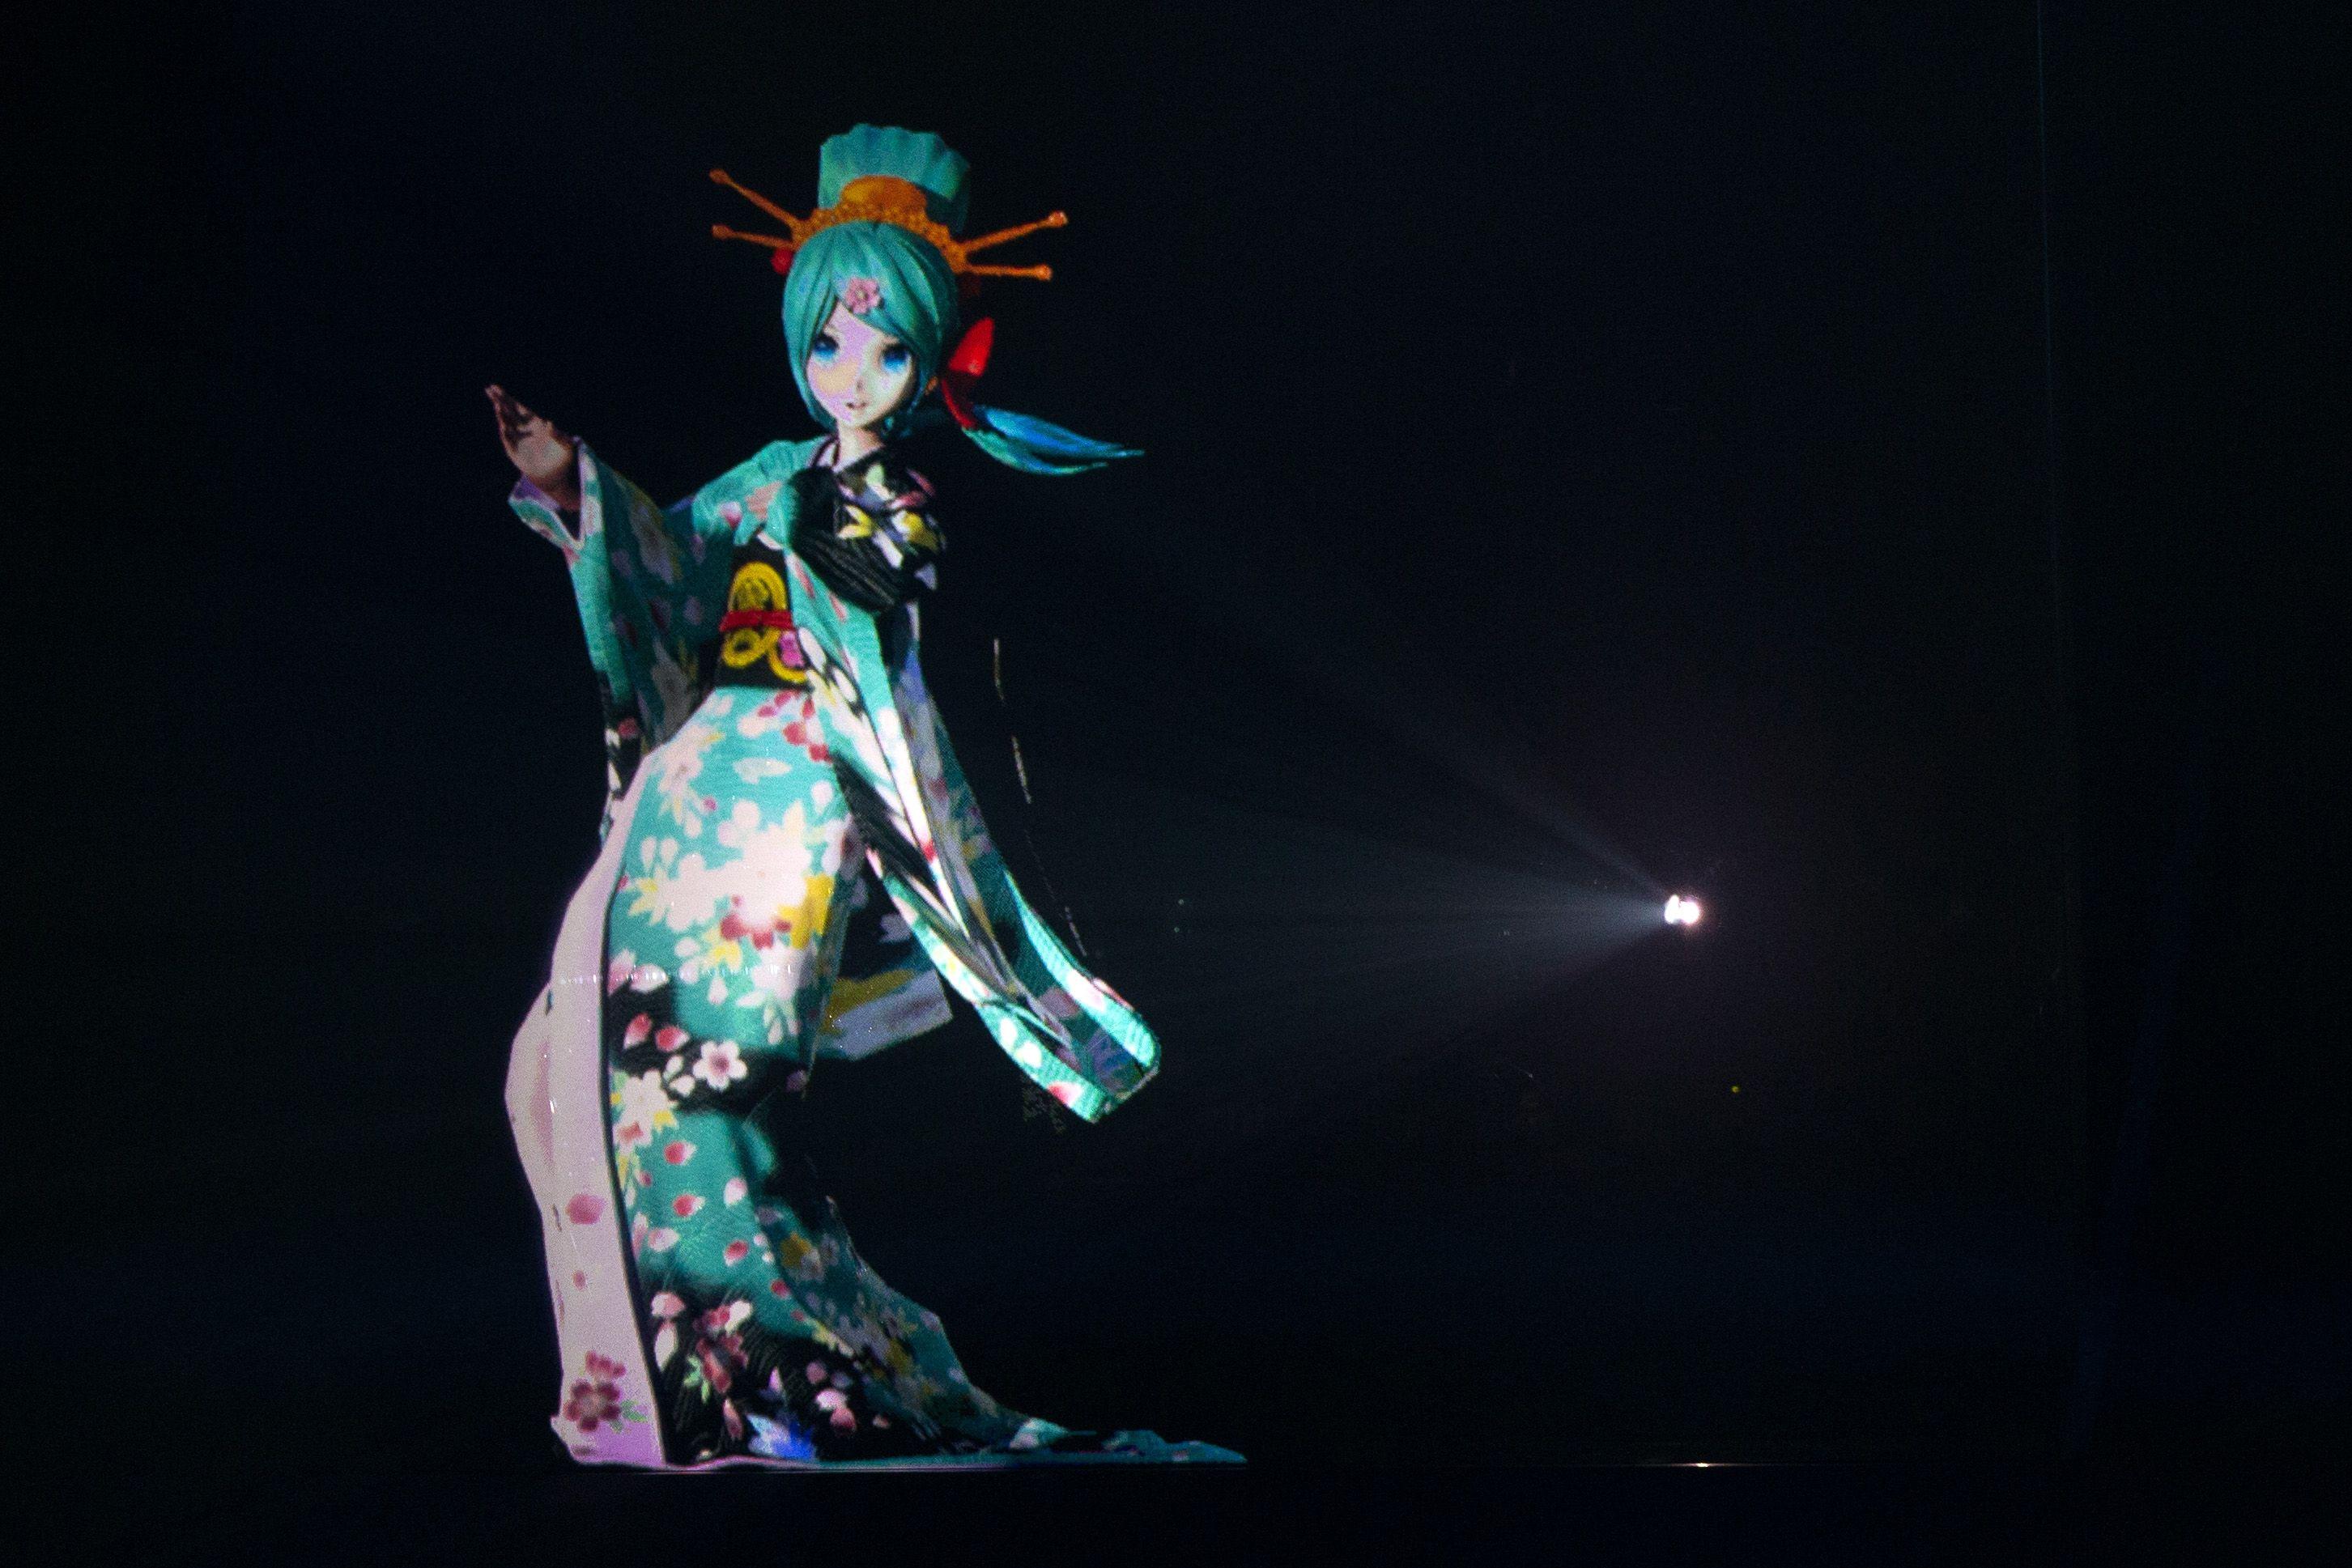 Hatsune Miku Holographic Japanese Idol Makes Her Coachella Debut Hatsune Miku Japanese Pop Miku